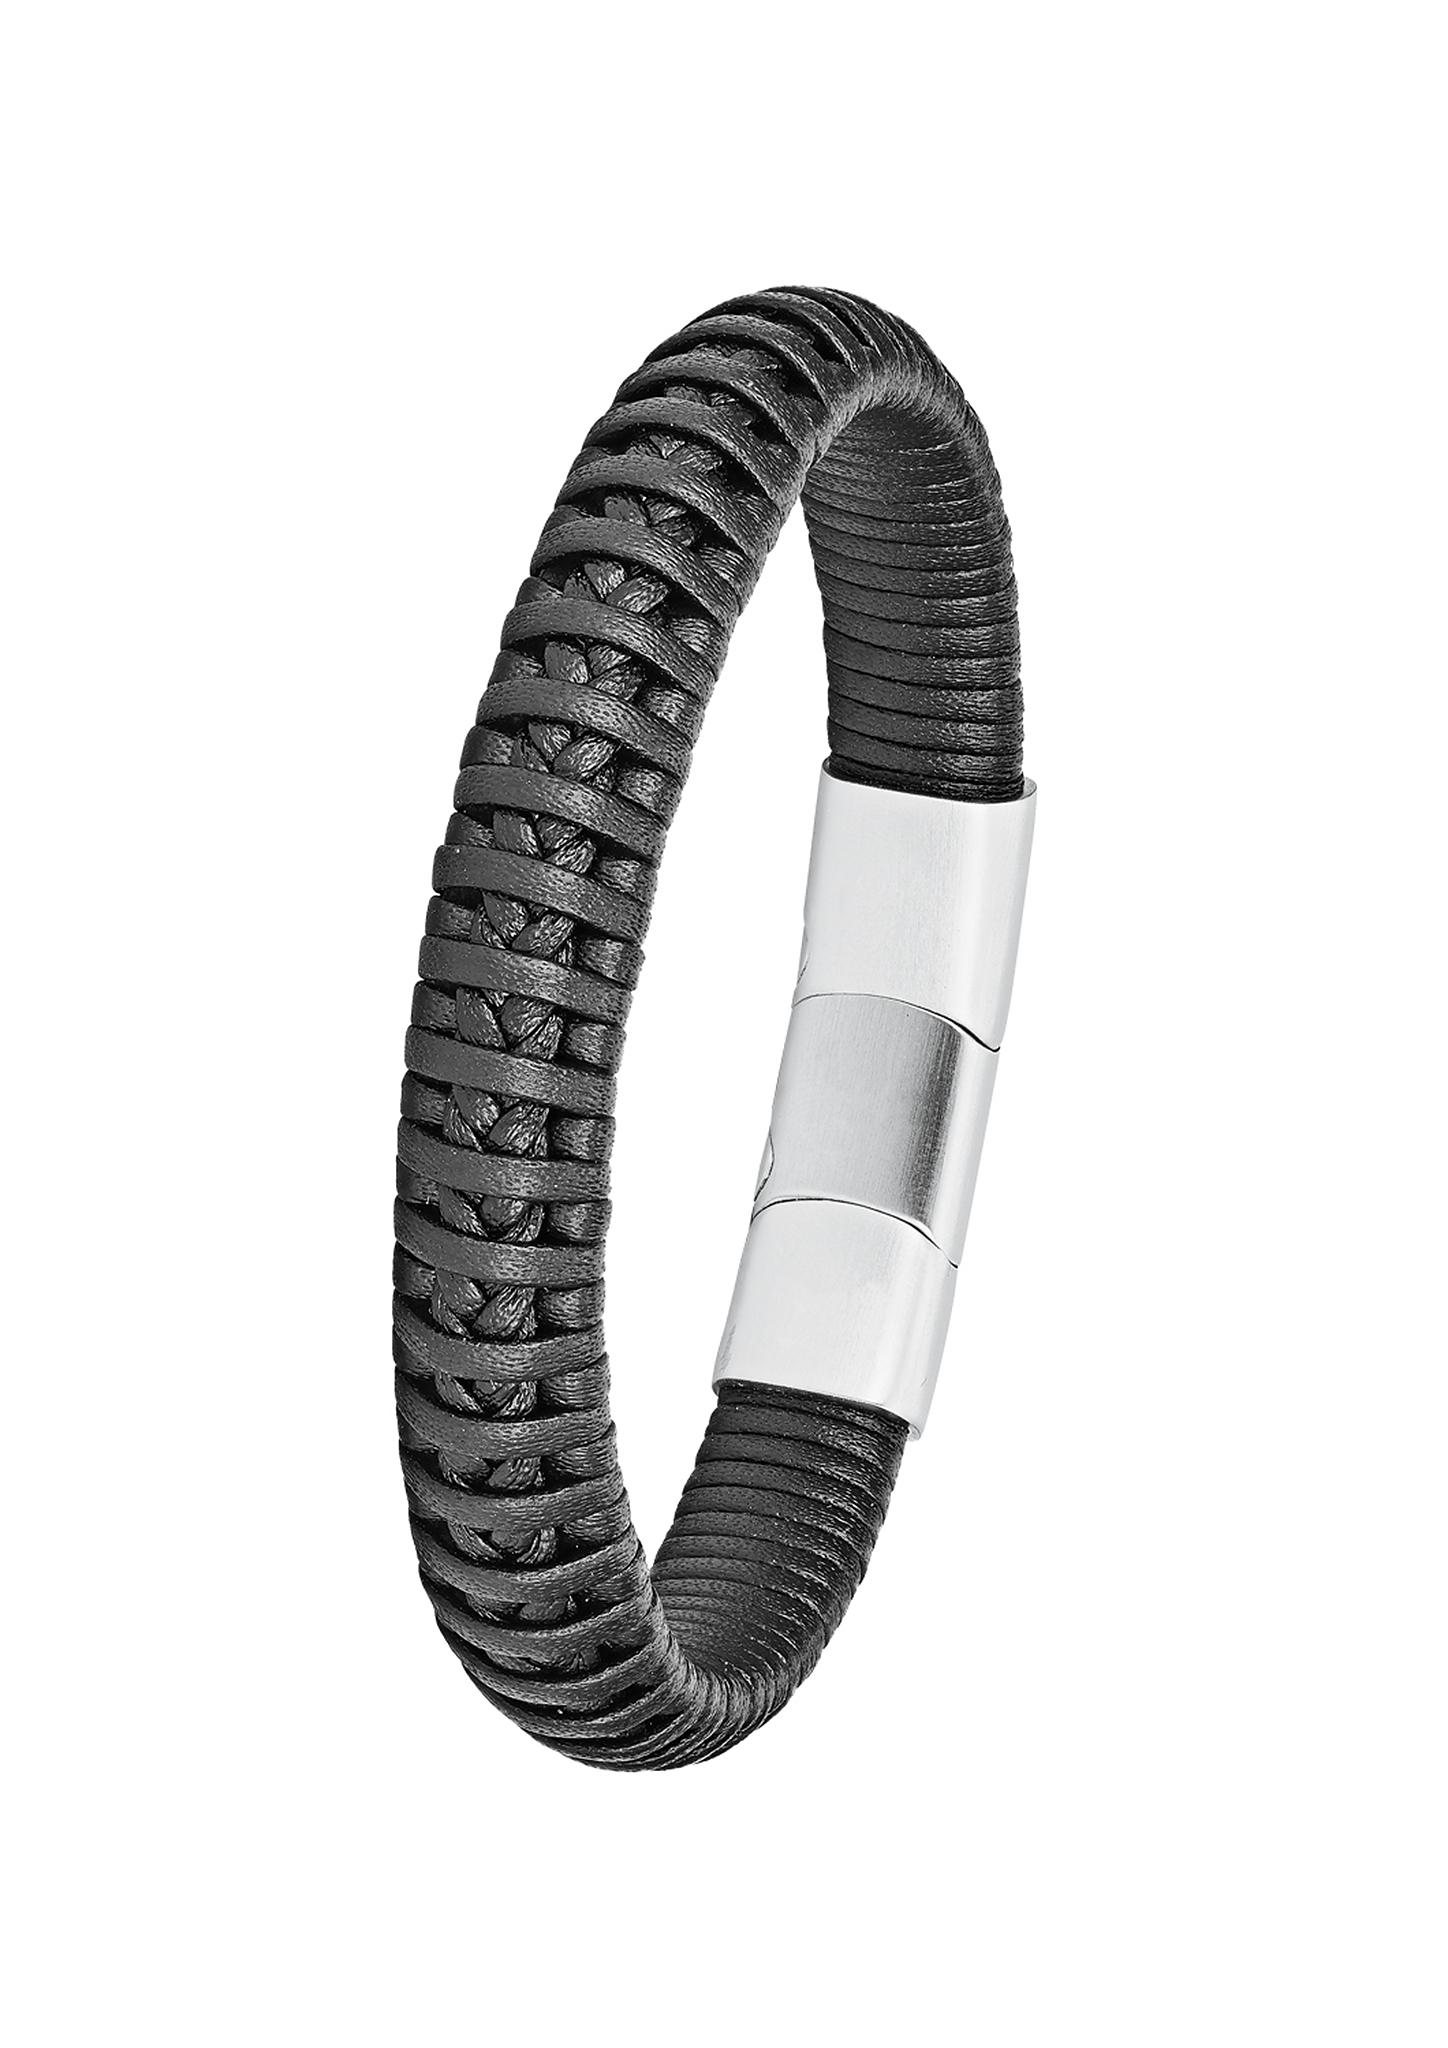 Armband   Schmuck > Armbänder   Schwarz   Edelstahl   s.Oliver